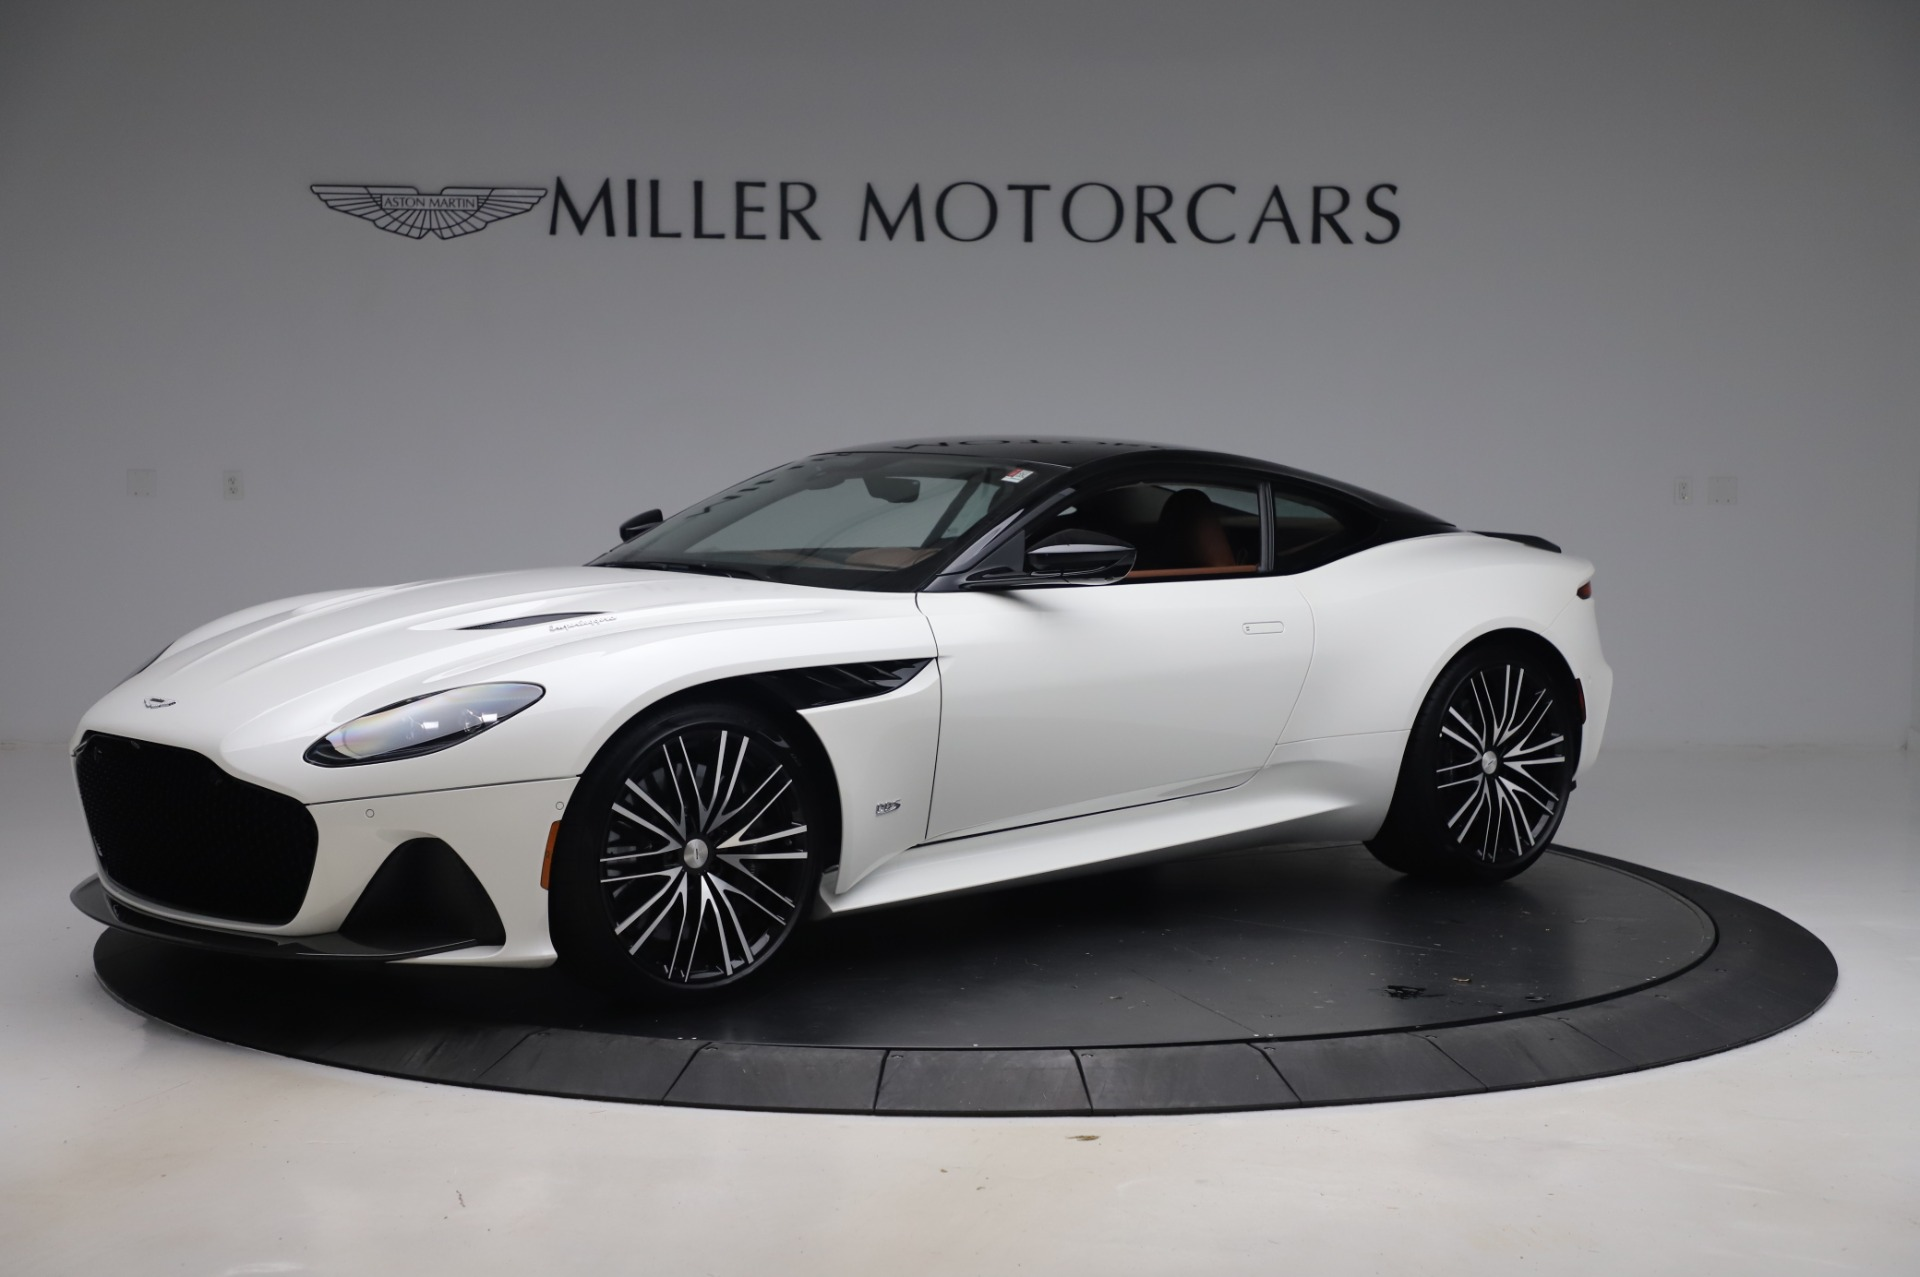 Used 2020 Aston Martin DBS Superleggera for sale $299,990 at Aston Martin of Greenwich in Greenwich CT 06830 1